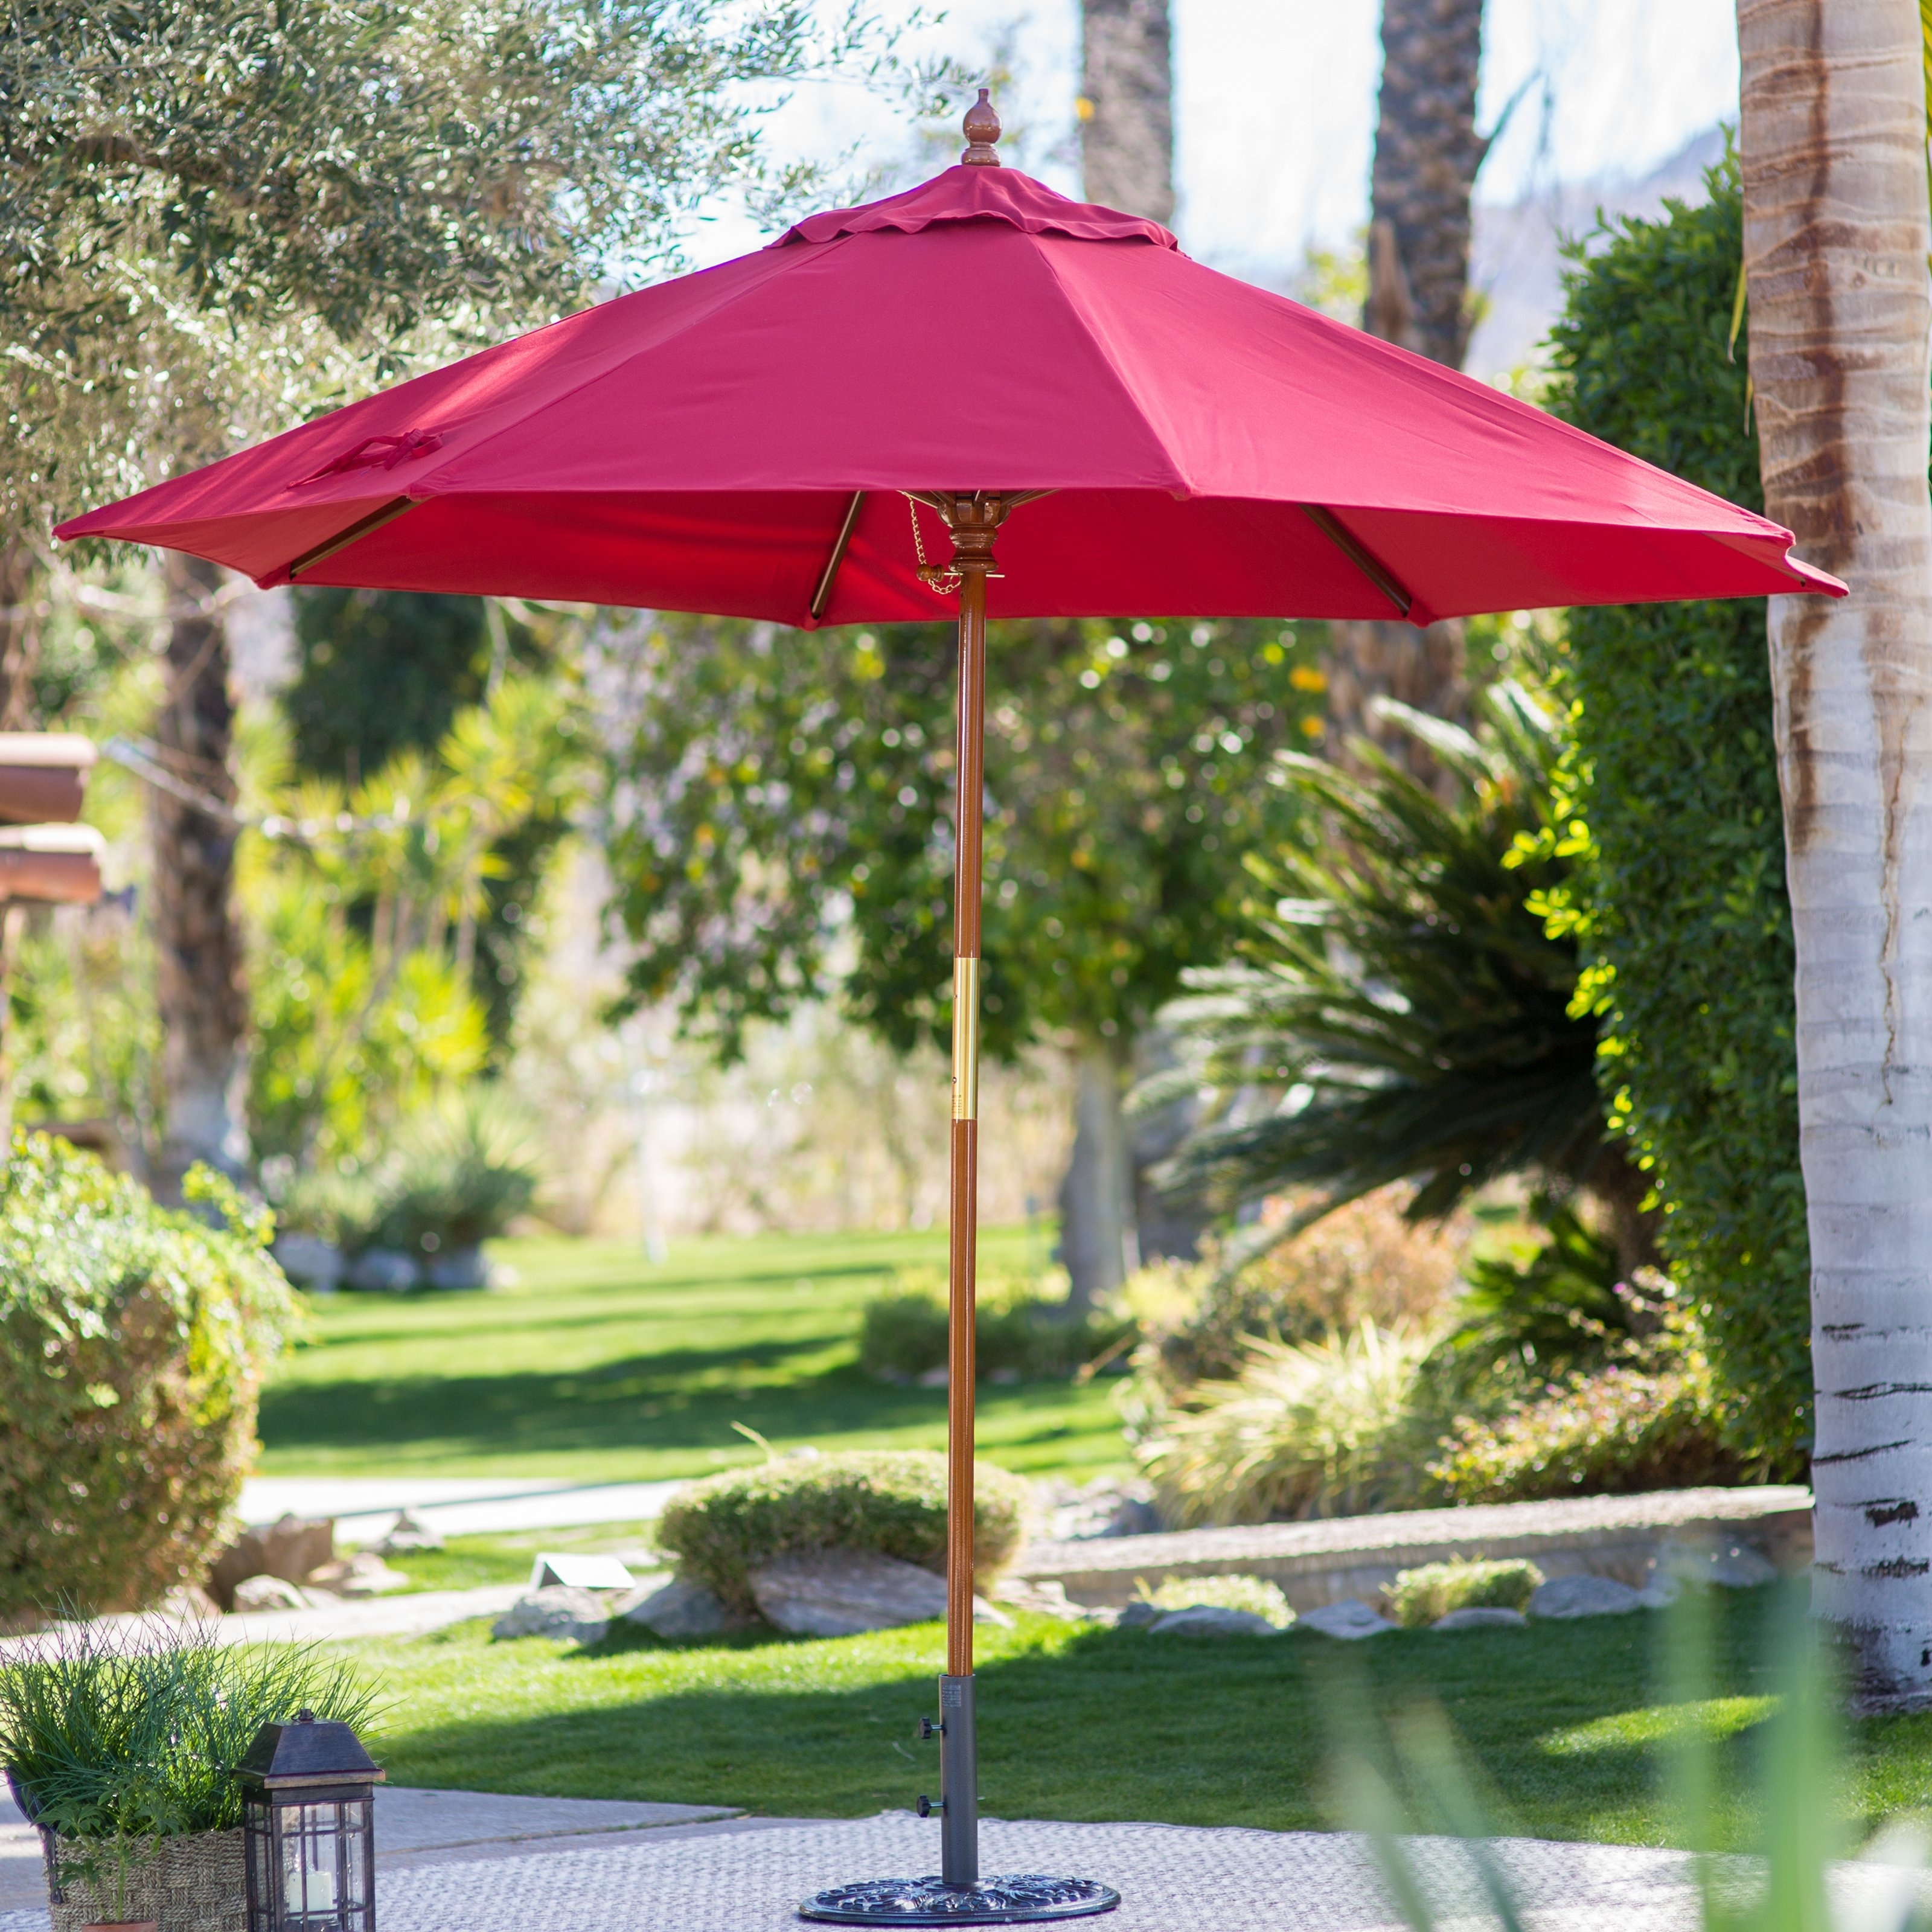 Sunbrella Patio Umbrellas Inside Best And Newest Belham Living (View 6 of 20)